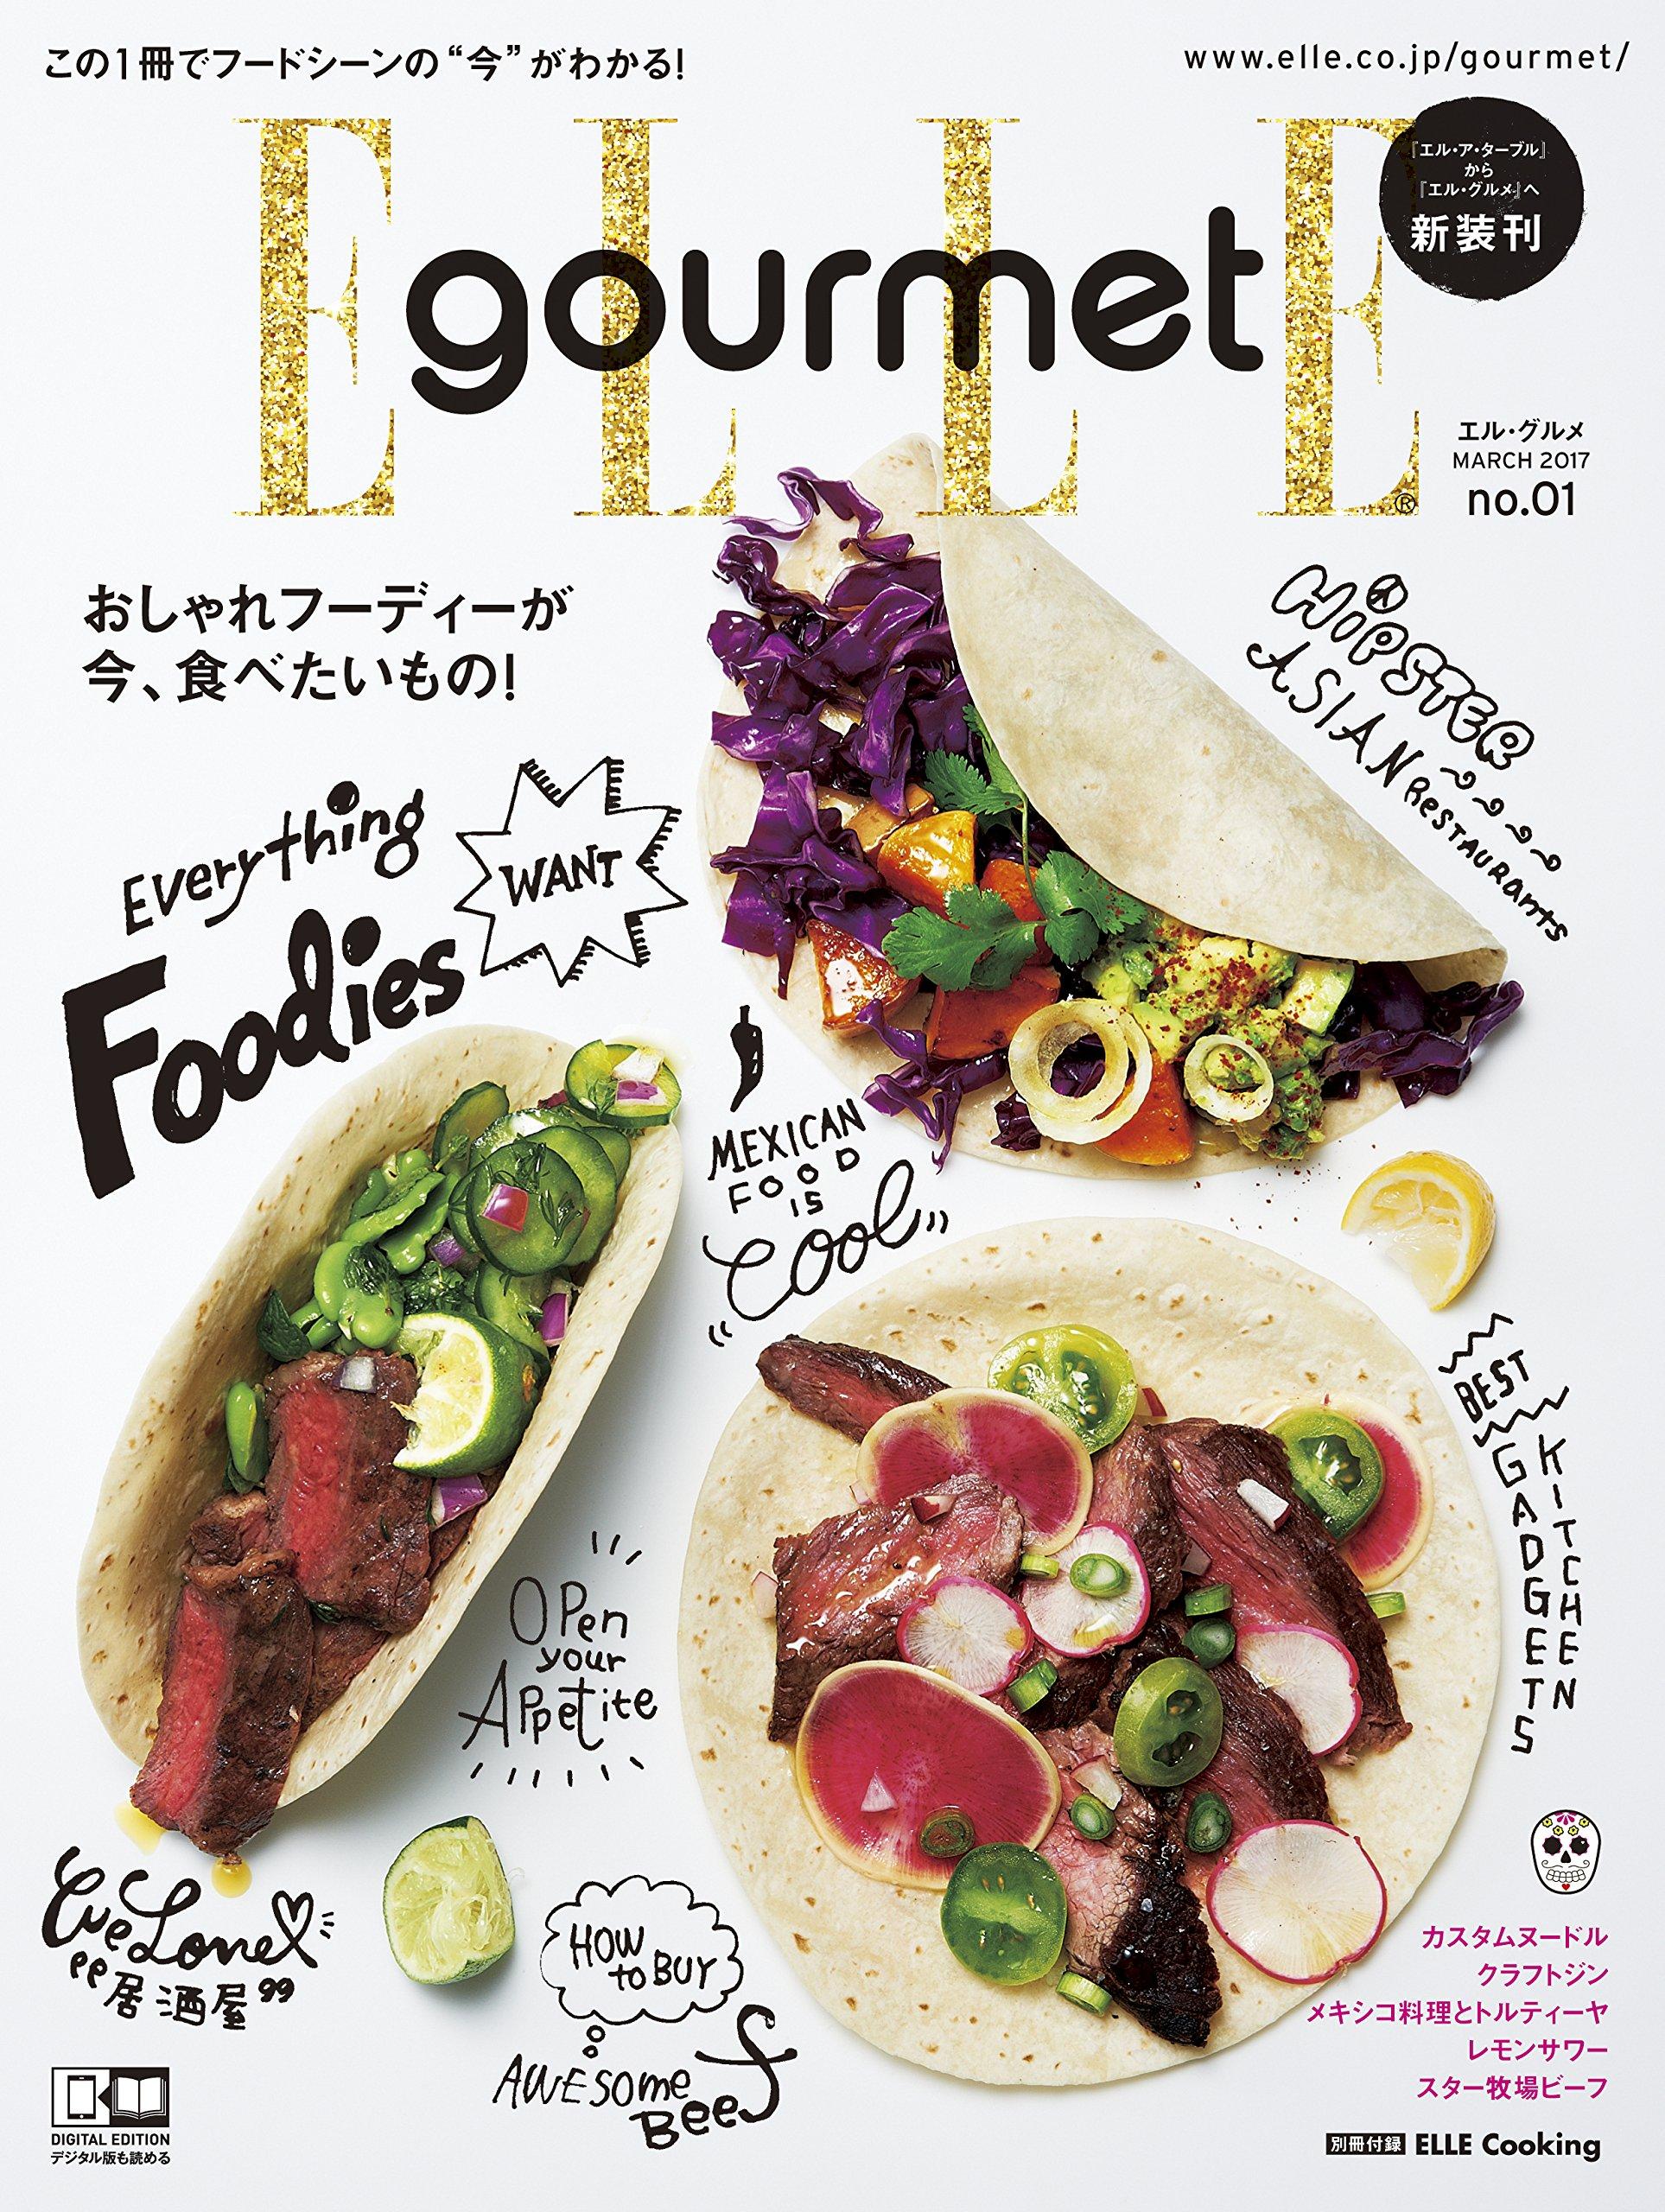 elle gourmet エル グルメ 2017年 03月号 ハースト婦人画報社 本